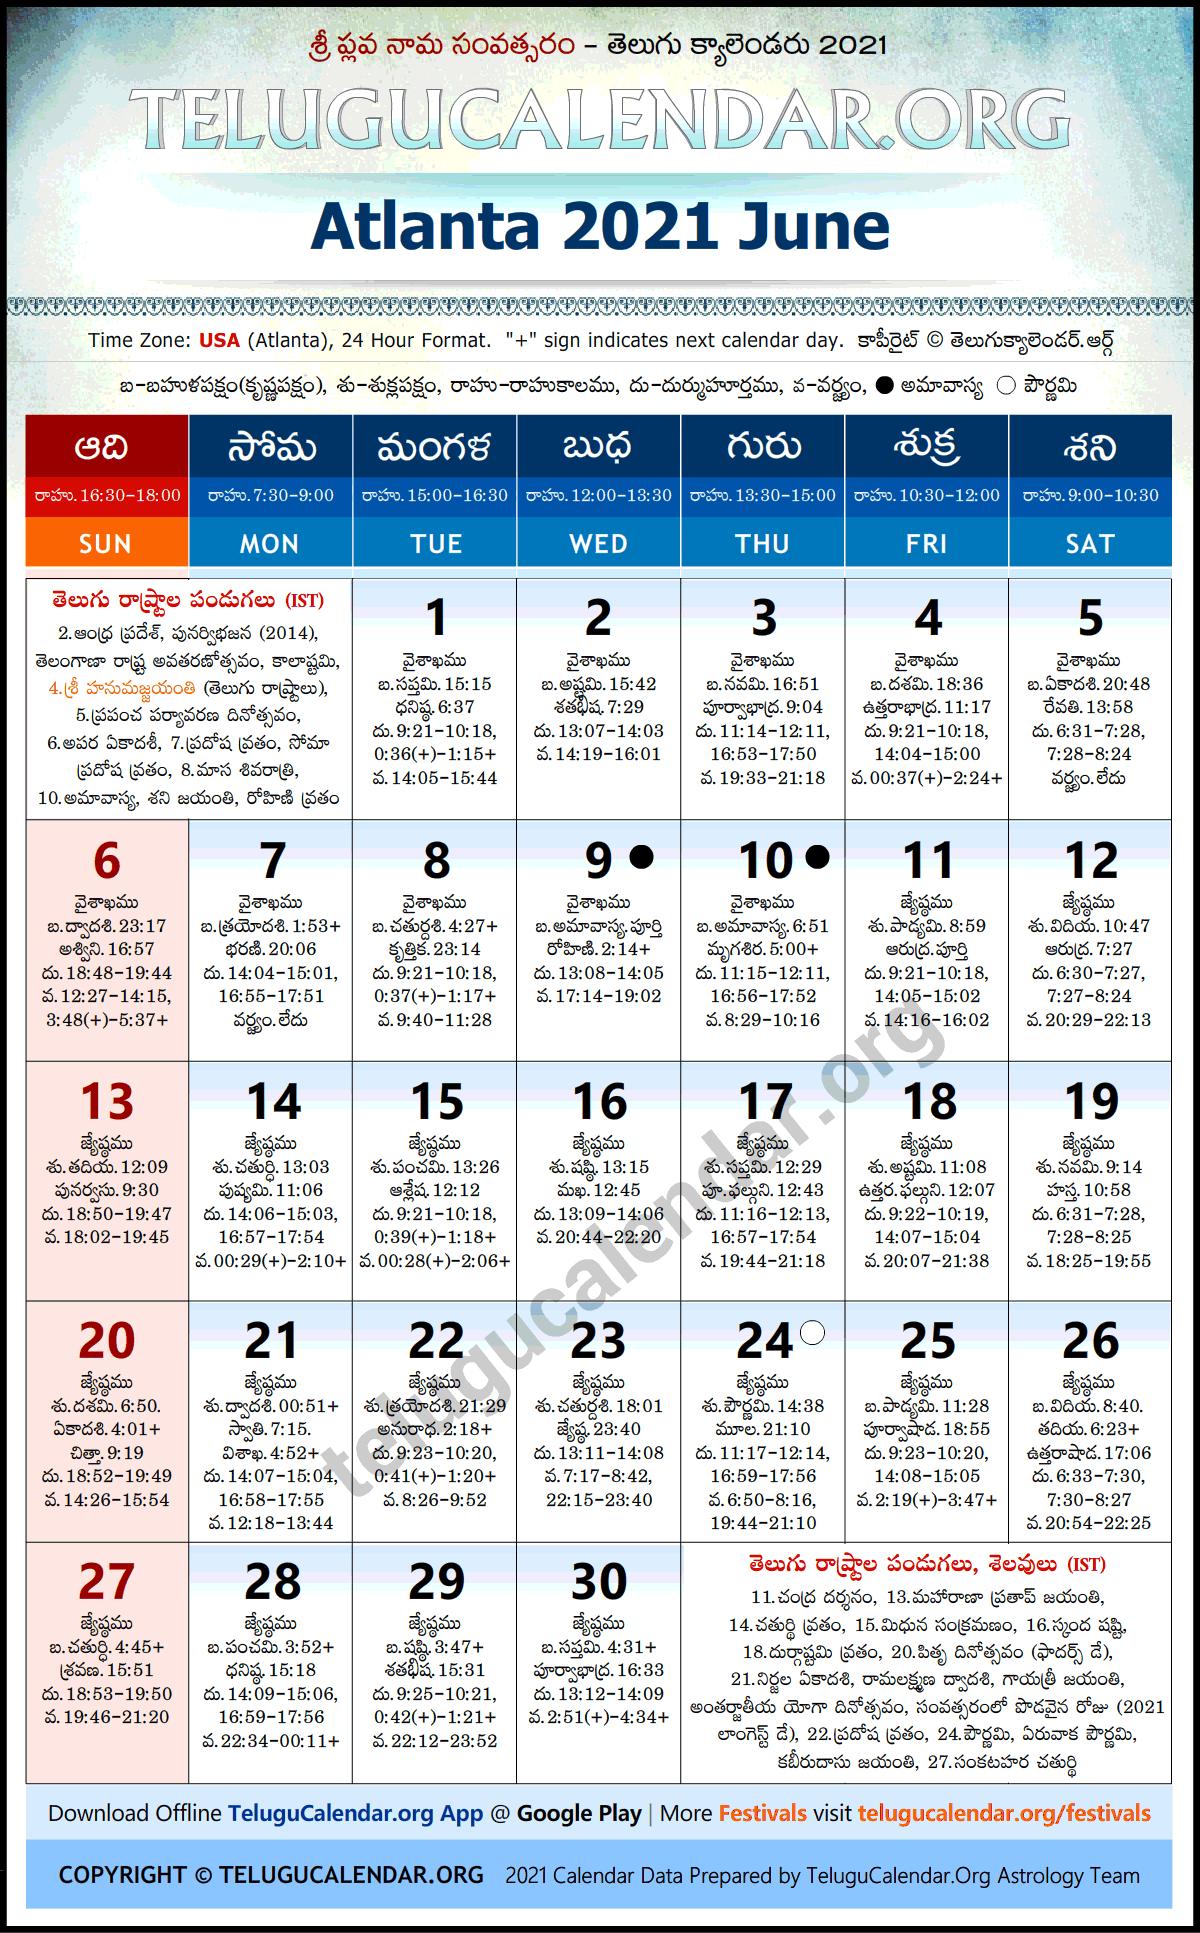 Telugu Calendar 2022 Atlanta.Atlanta Telugu Calendar 2021 June Festivals Holidays Ist